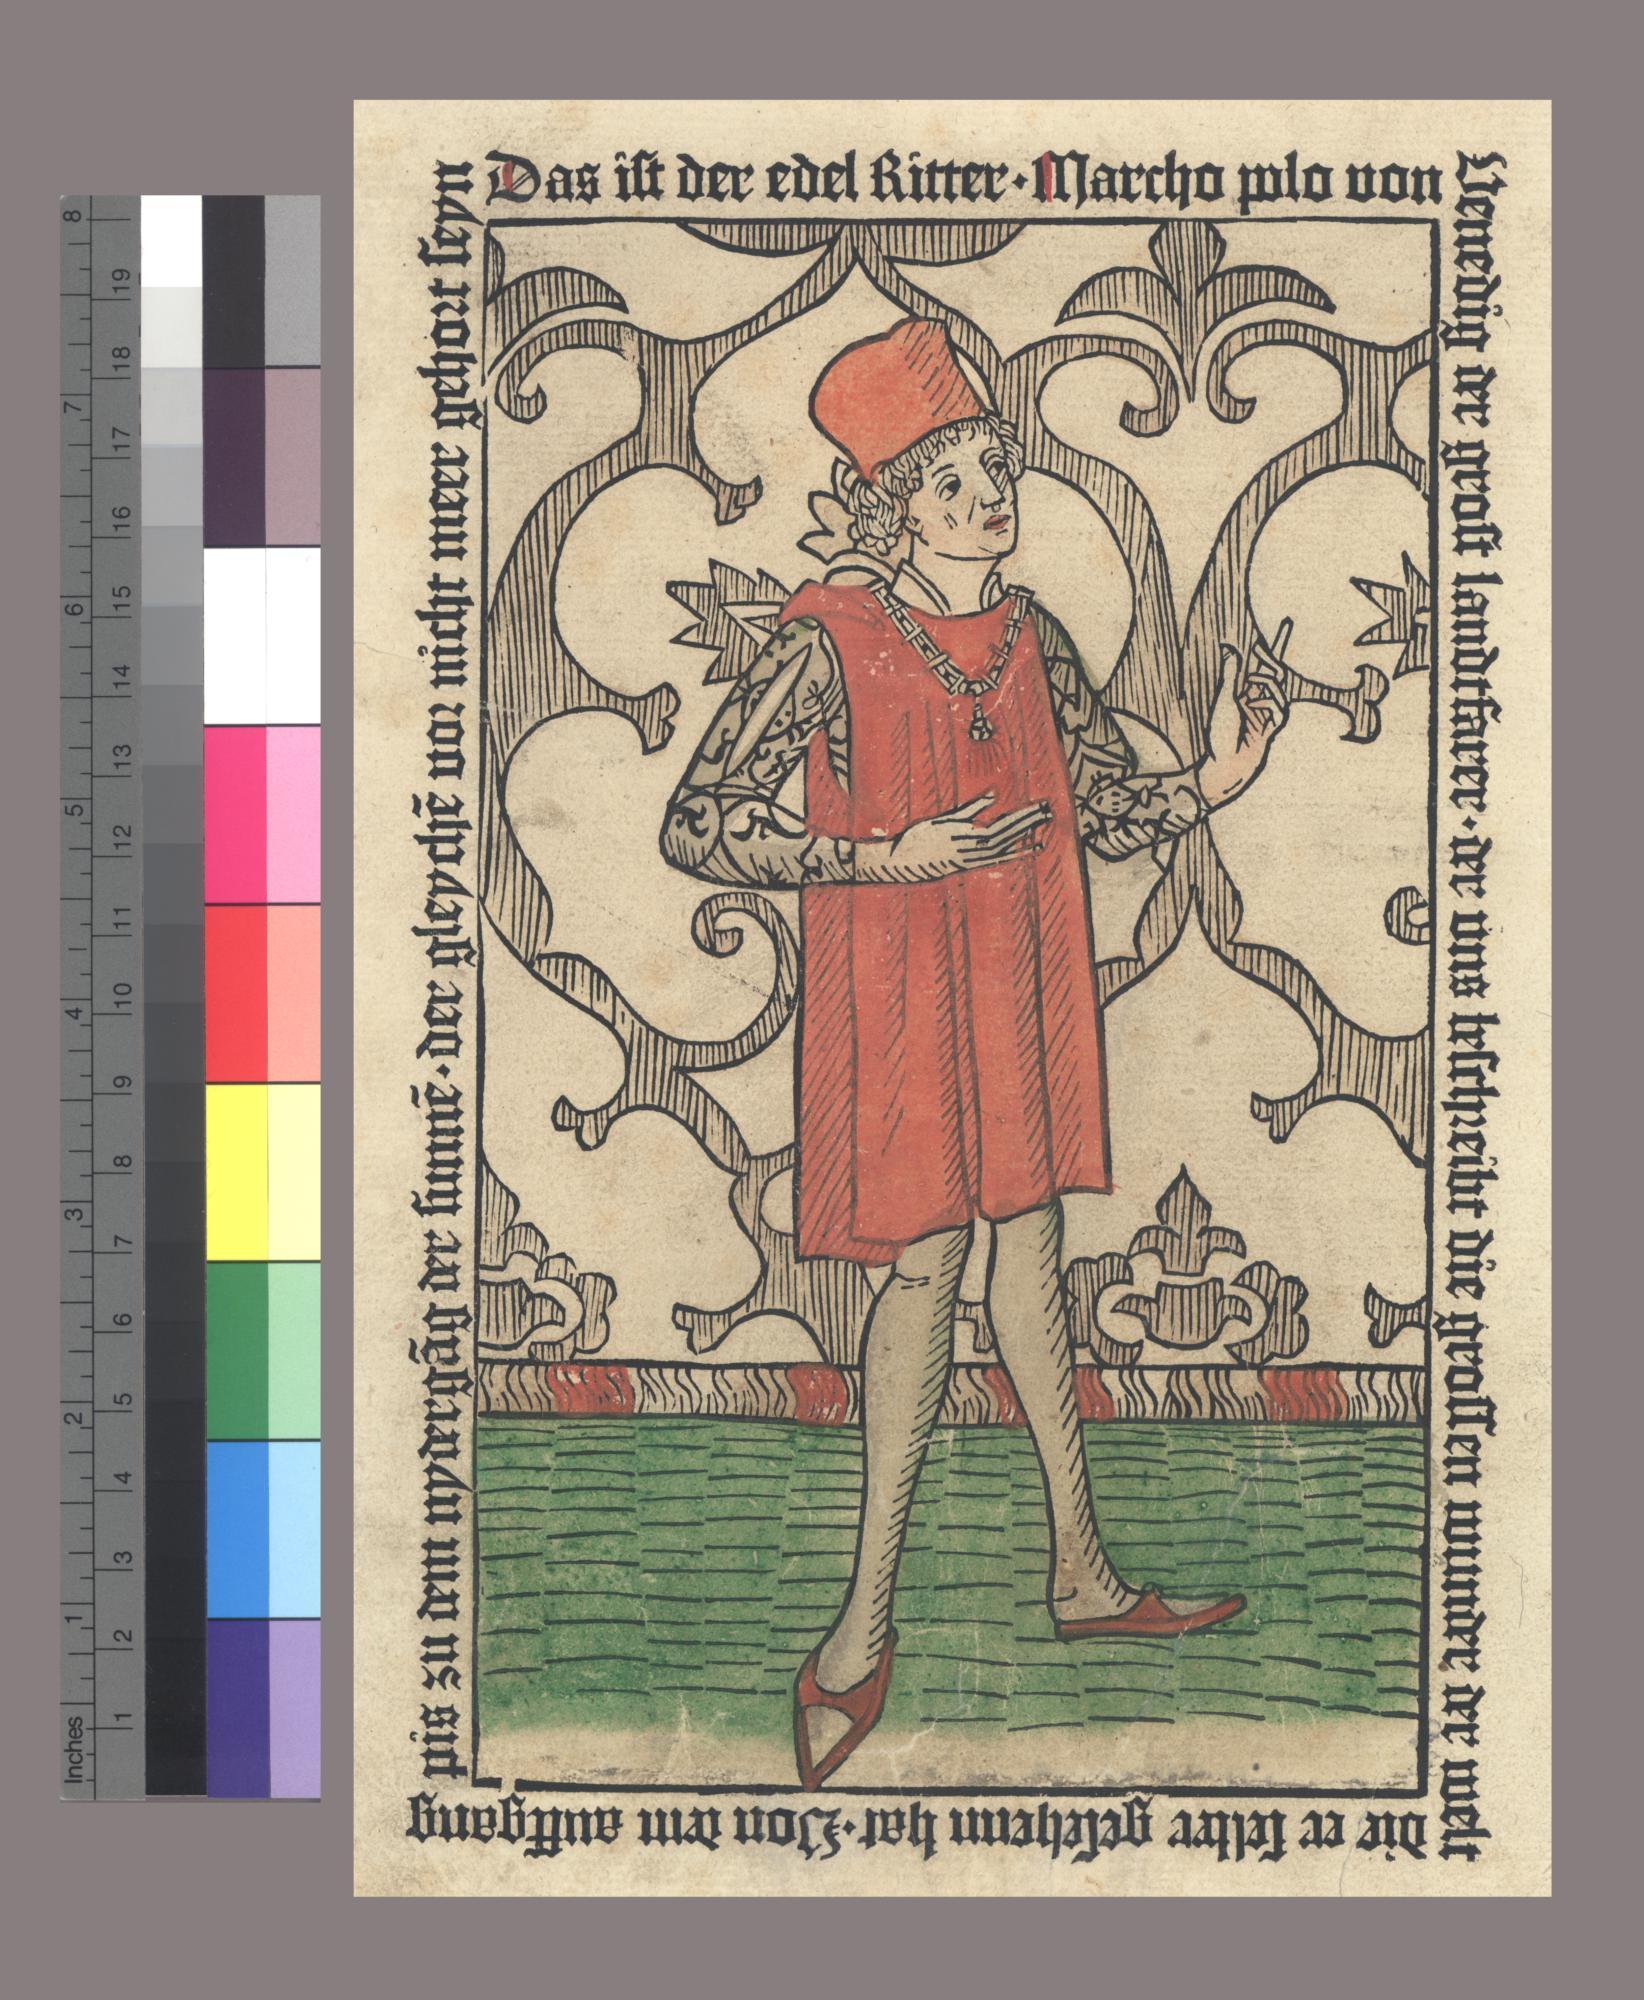 Buch des edeln Ritters und Landtfahrers Marco Polo